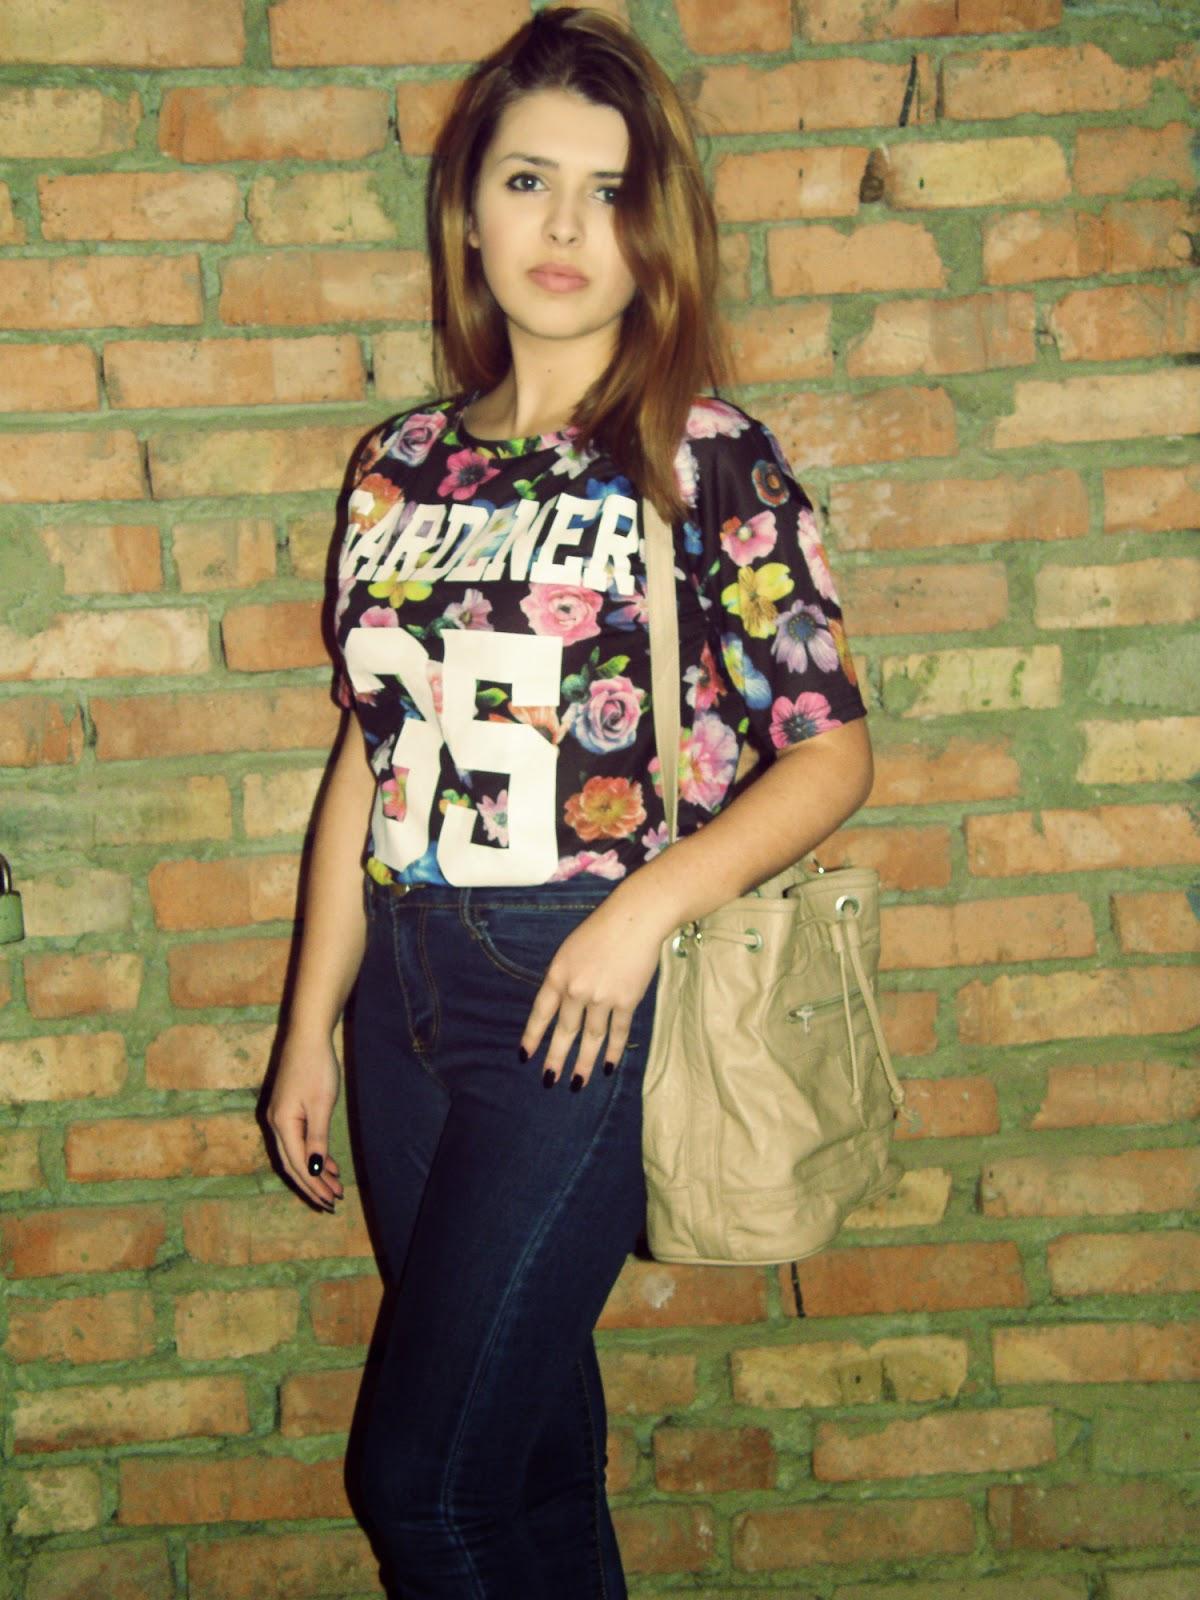 Gardener t-shirt ;*